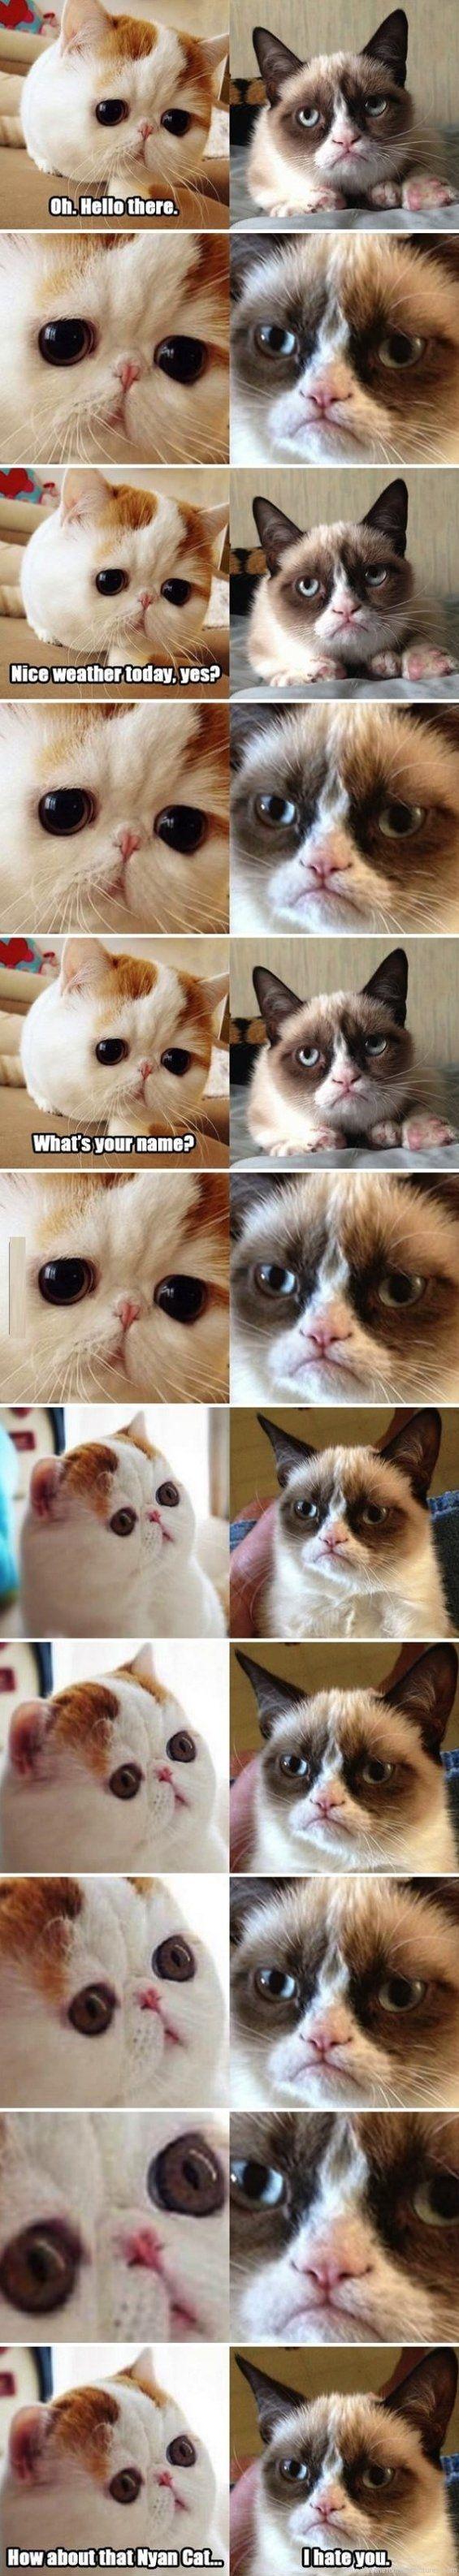 Snoopy Cat Meets Grumpy Cat.... How I feel when I talk to arlene hahahahah! @Arlene Nguyen @Nancy Lam @Jessica Phan